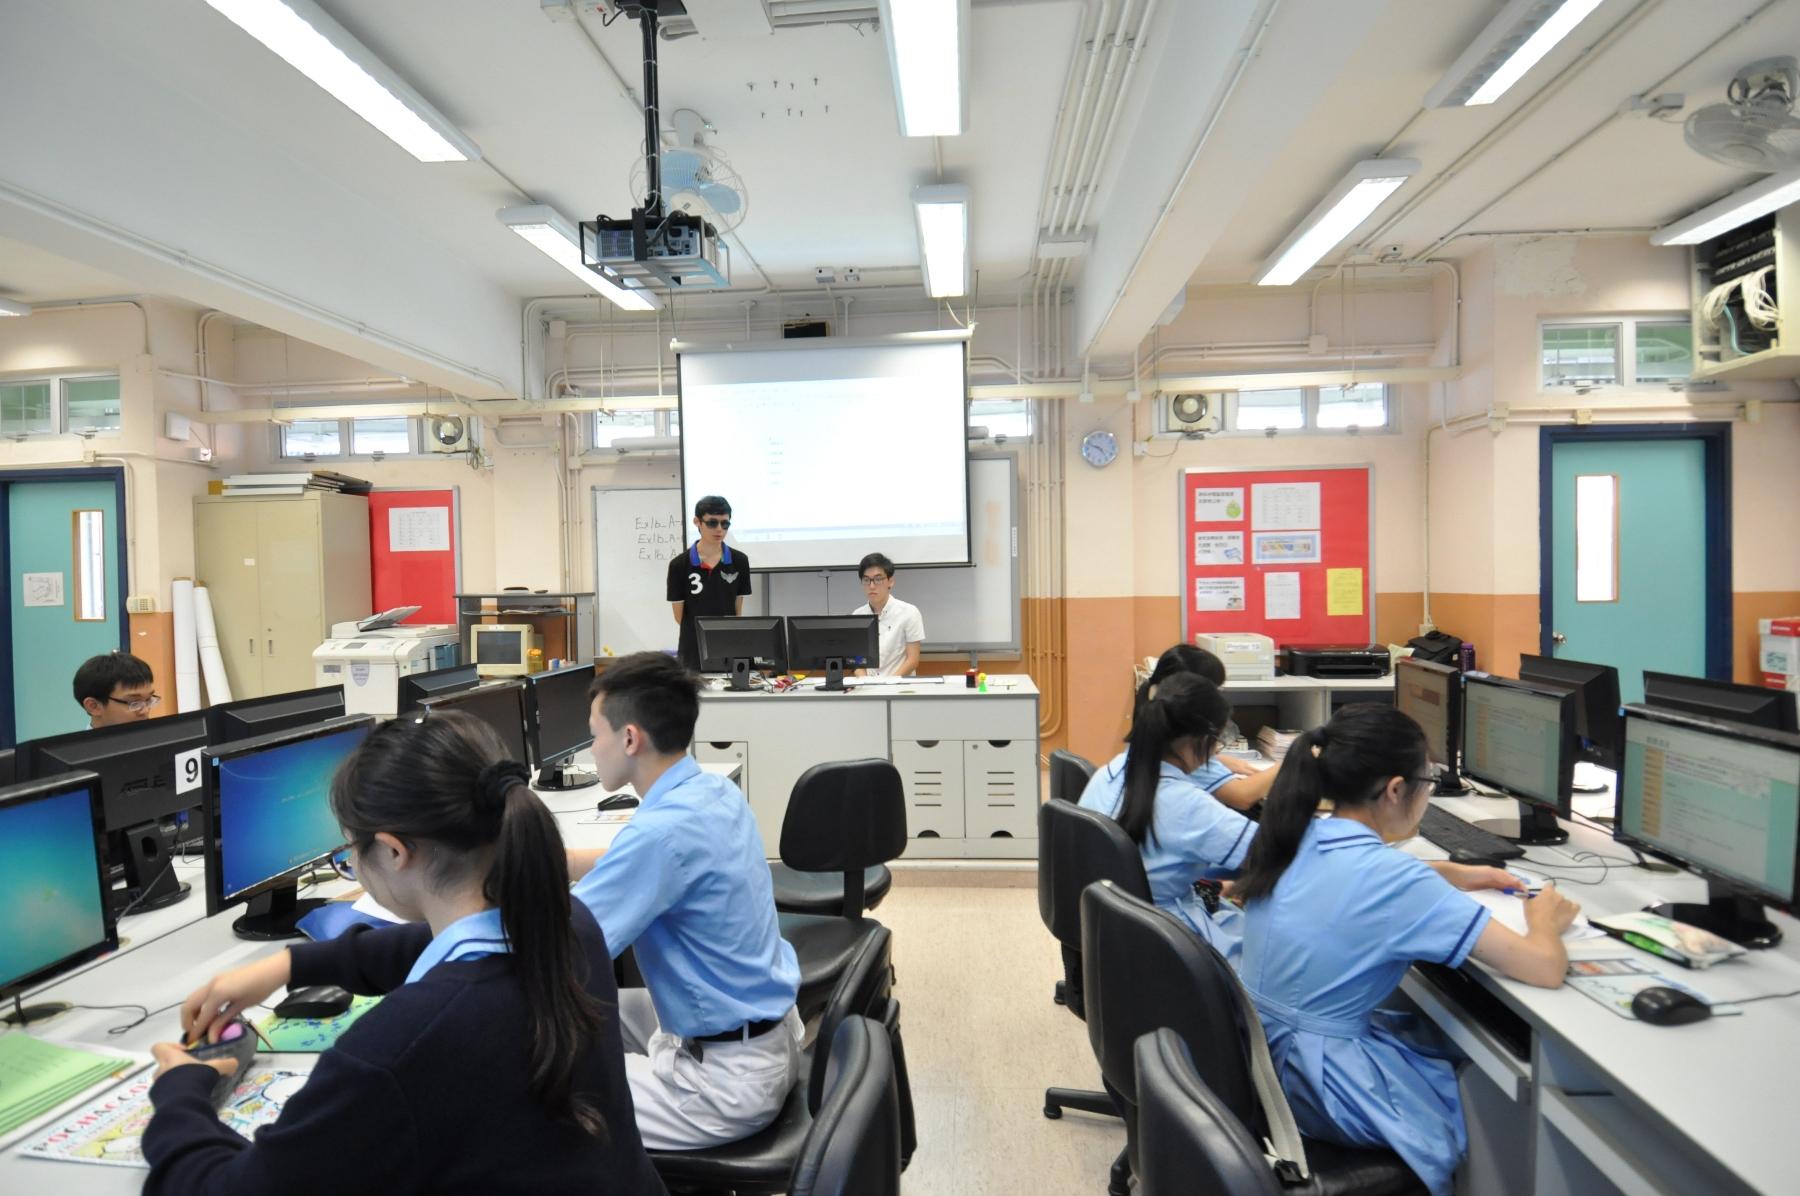 http://www.npc.edu.hk/sites/default/files/dsc_0232_1.jpg